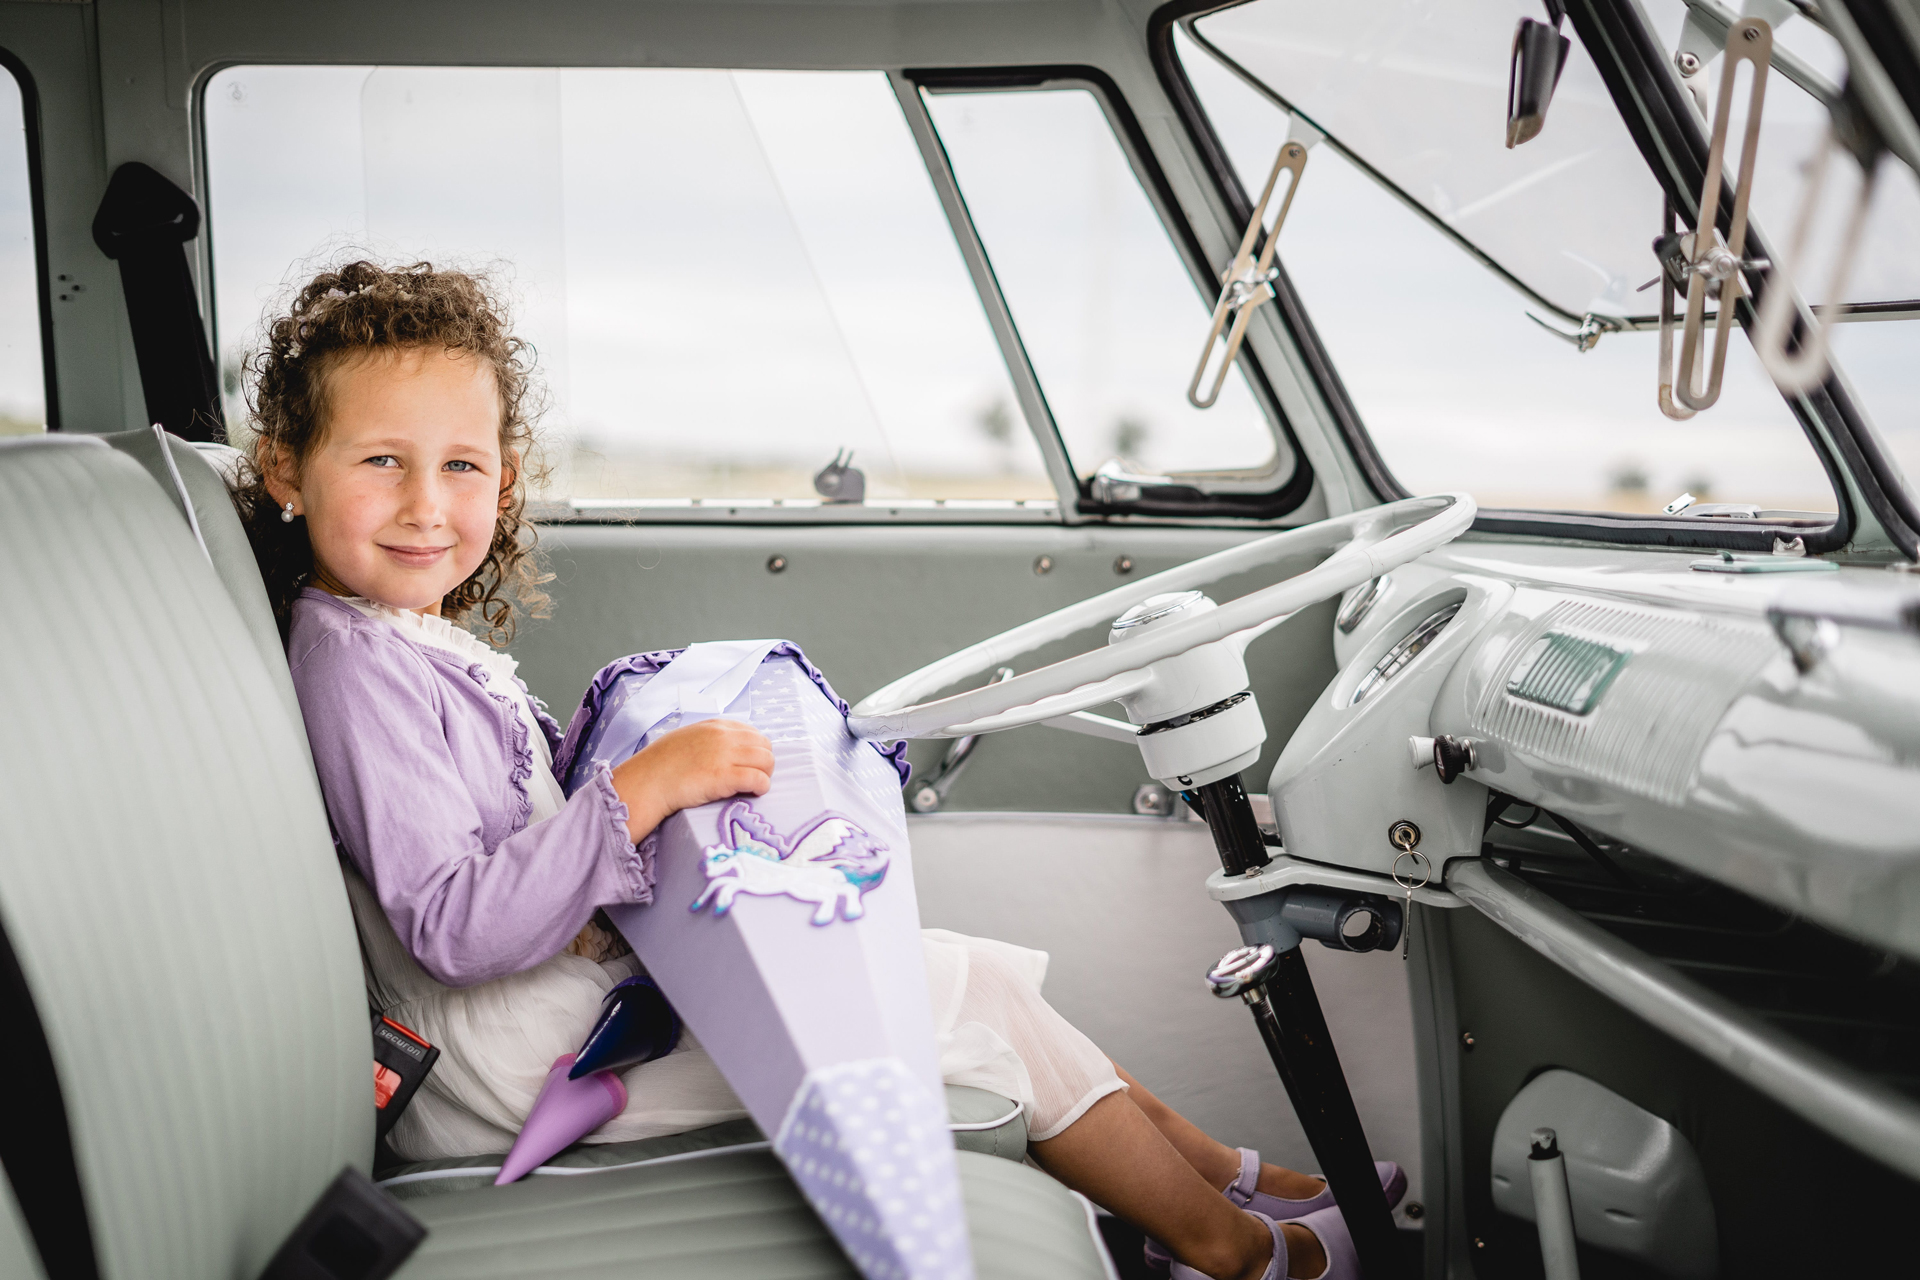 VW Bulli mieten Schulanfang Kindergeburtstag Fotoshooting Zuckertüte Familienausflug Lenkrad Fahrersitz Safarifenster